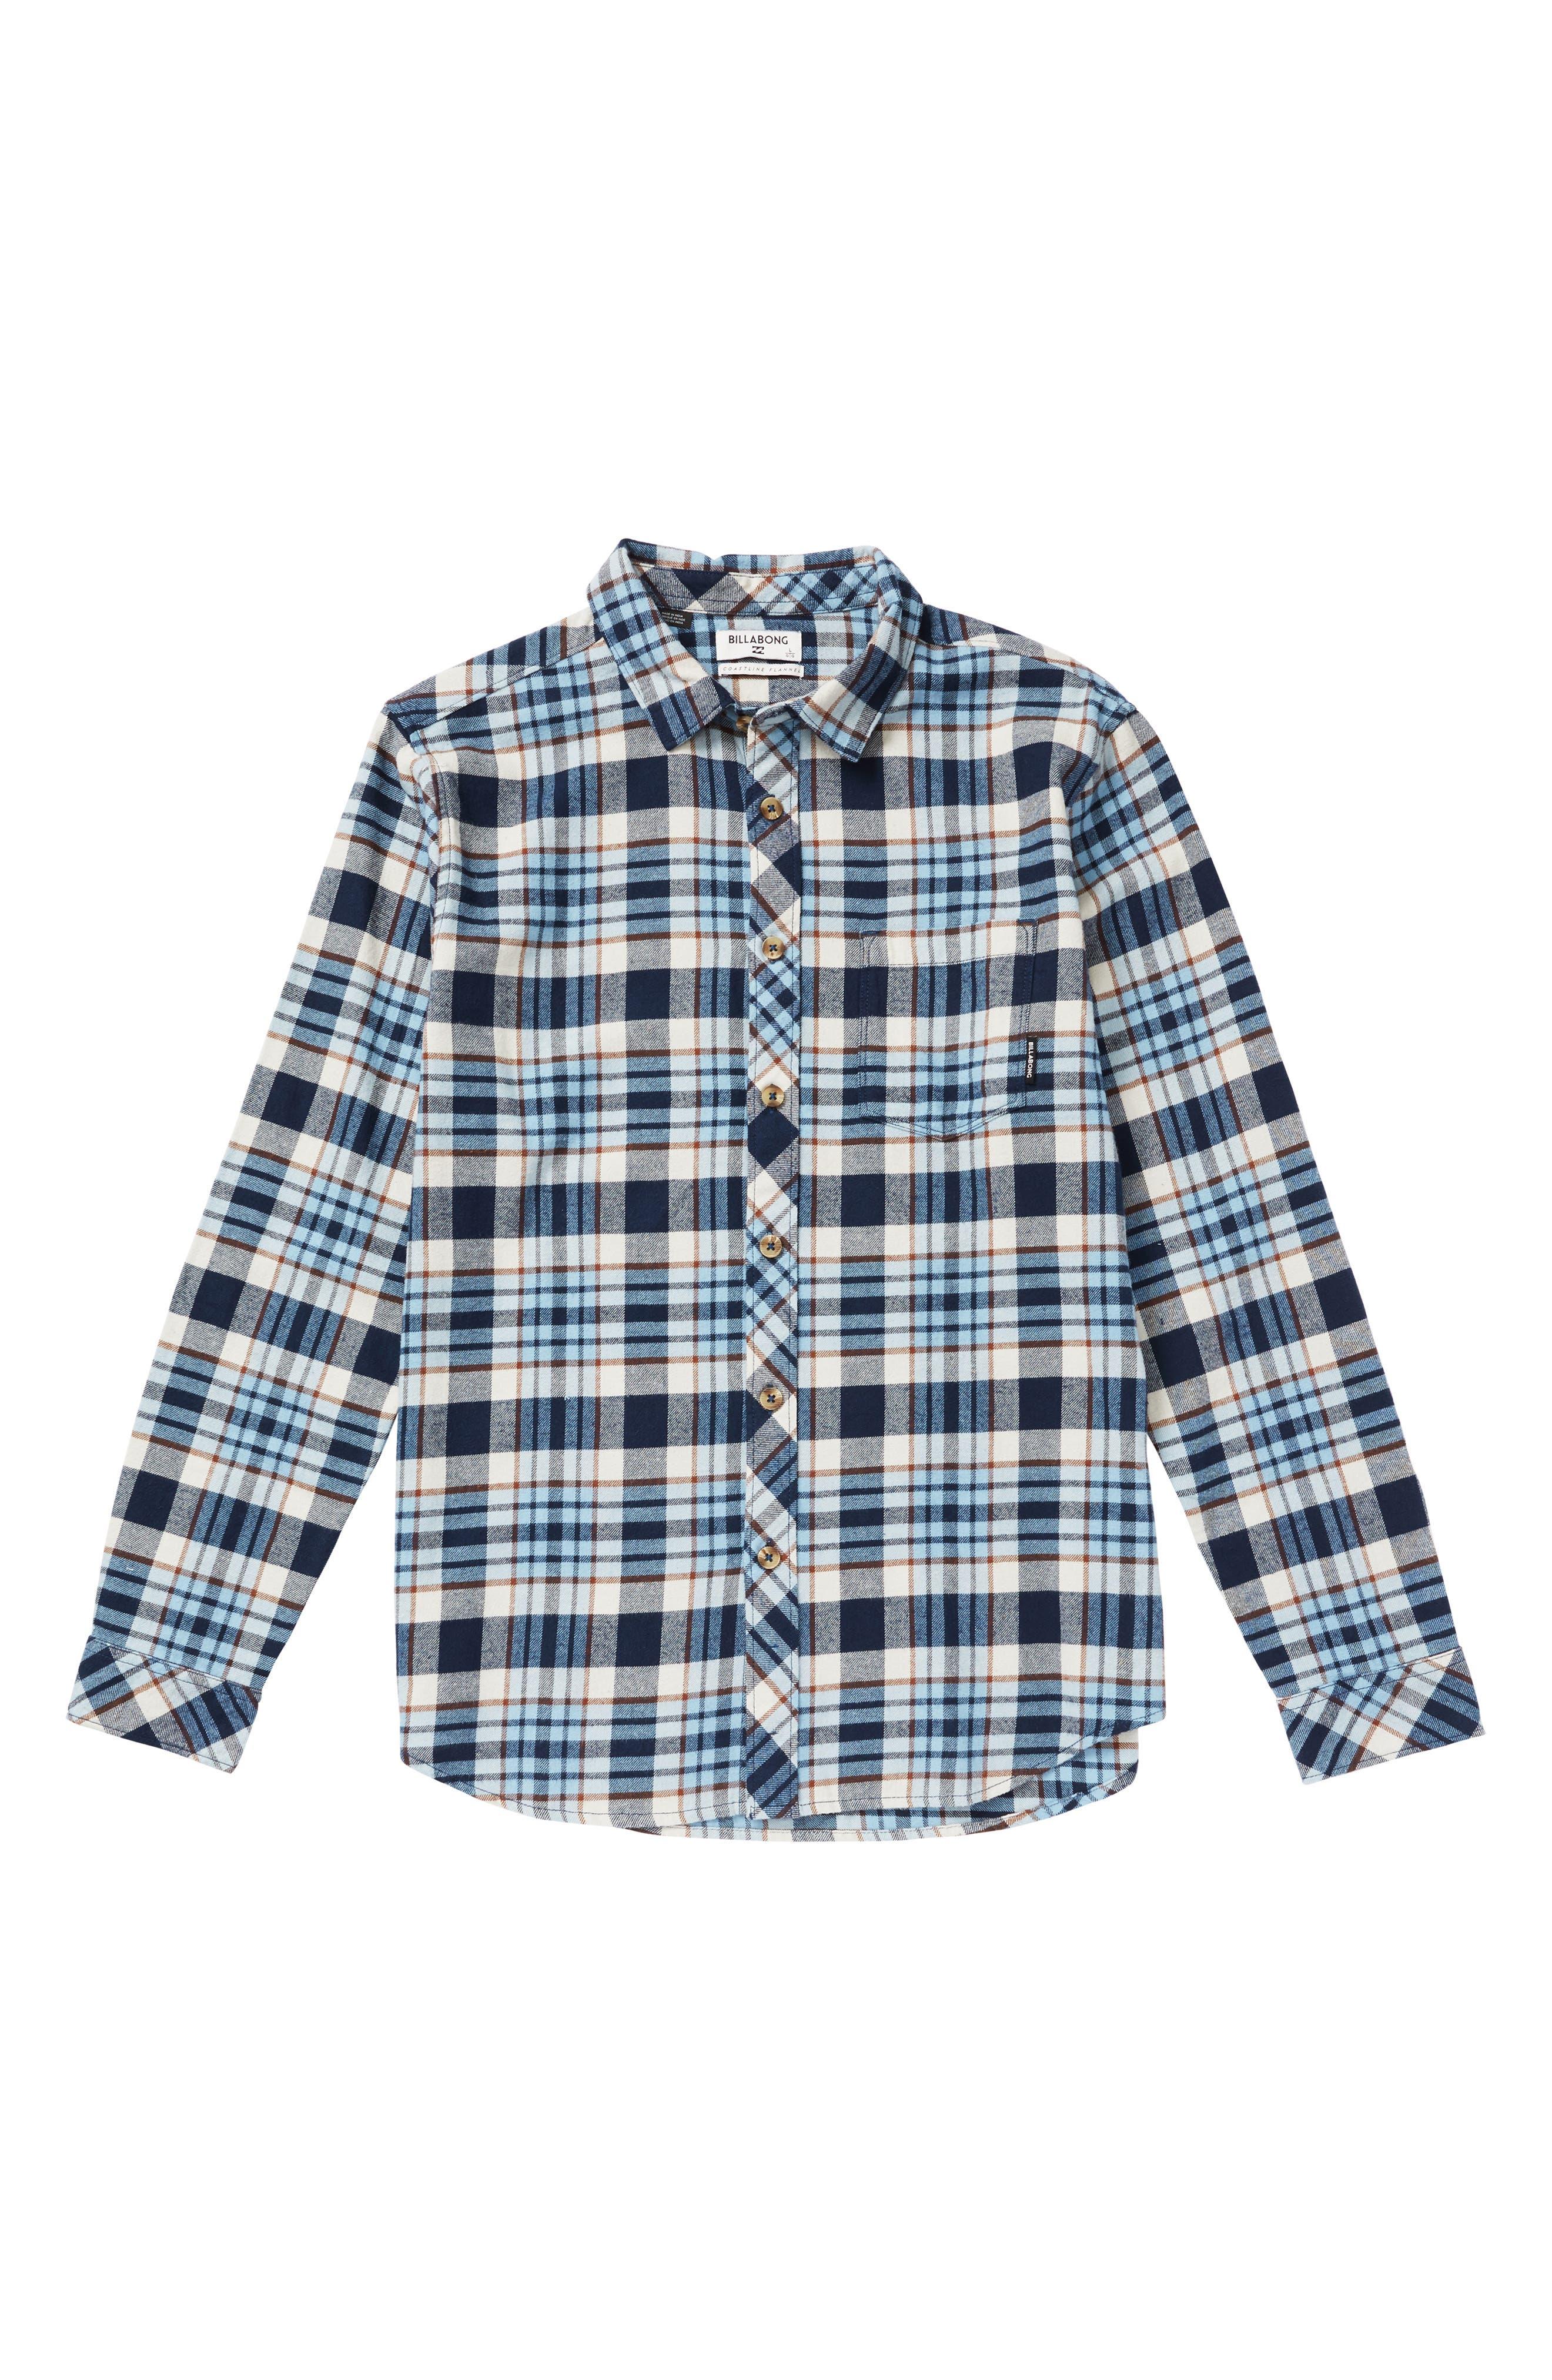 Boys Billabong Coastline Plaid Flannel Shirt Size S (4)  Blue